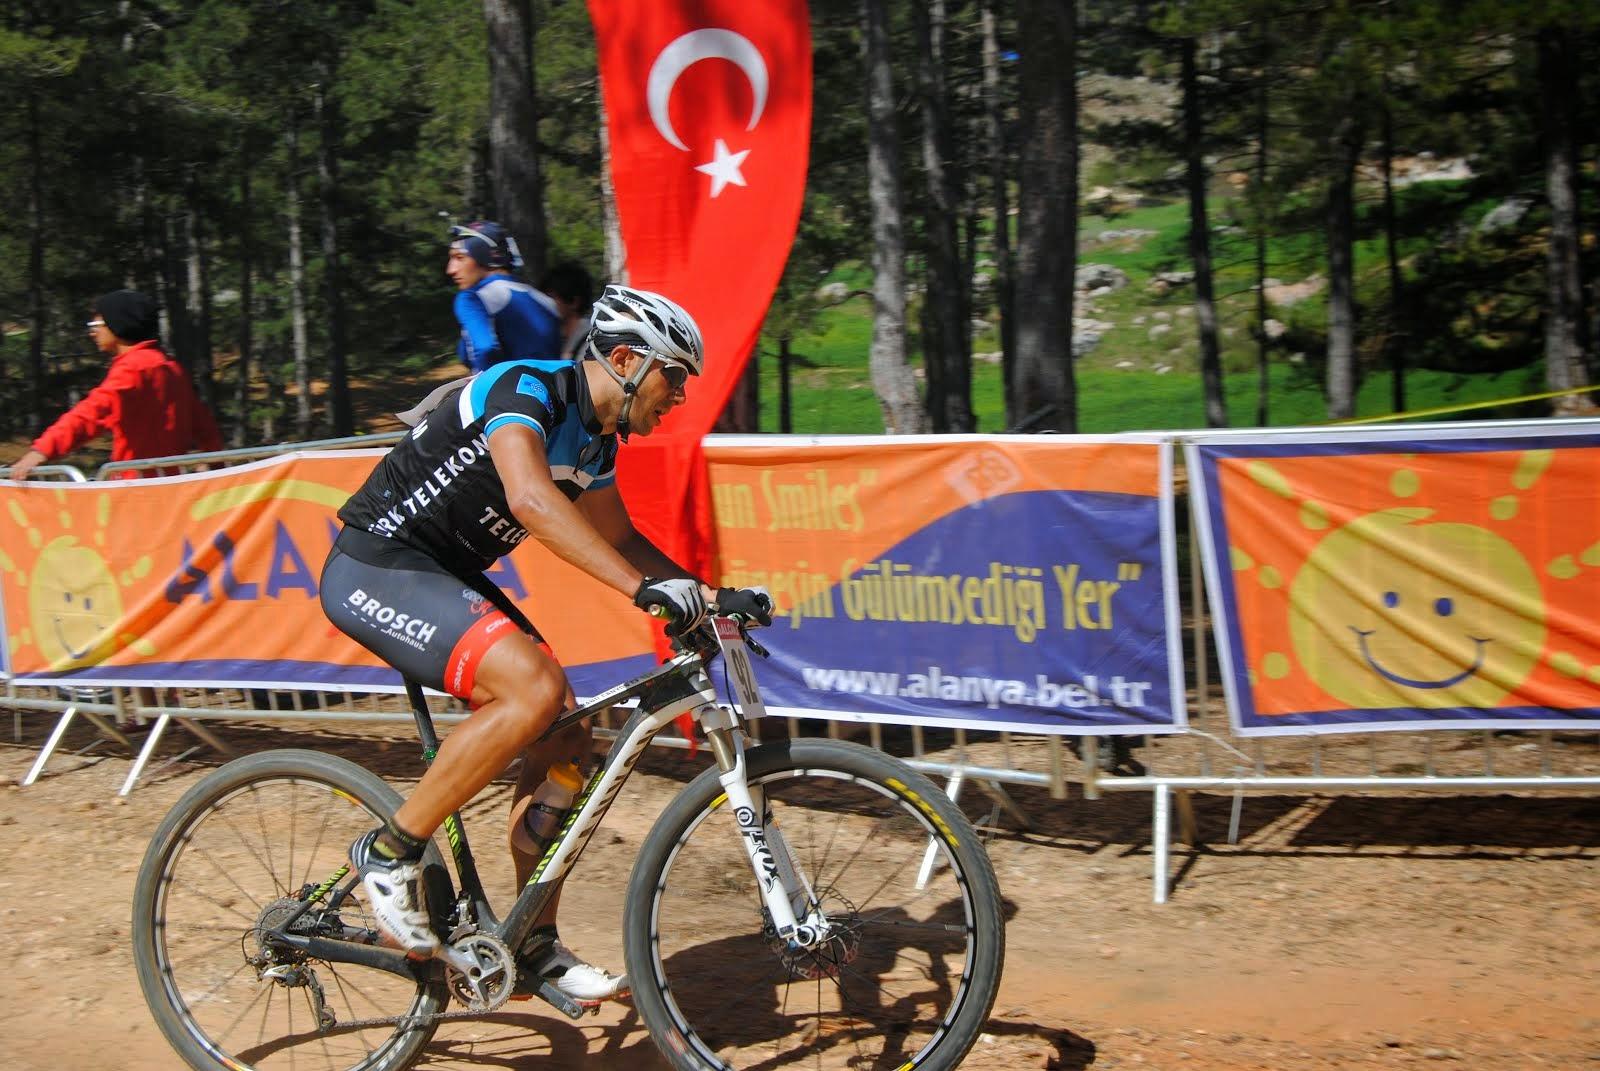 Mountainbiker Erkan